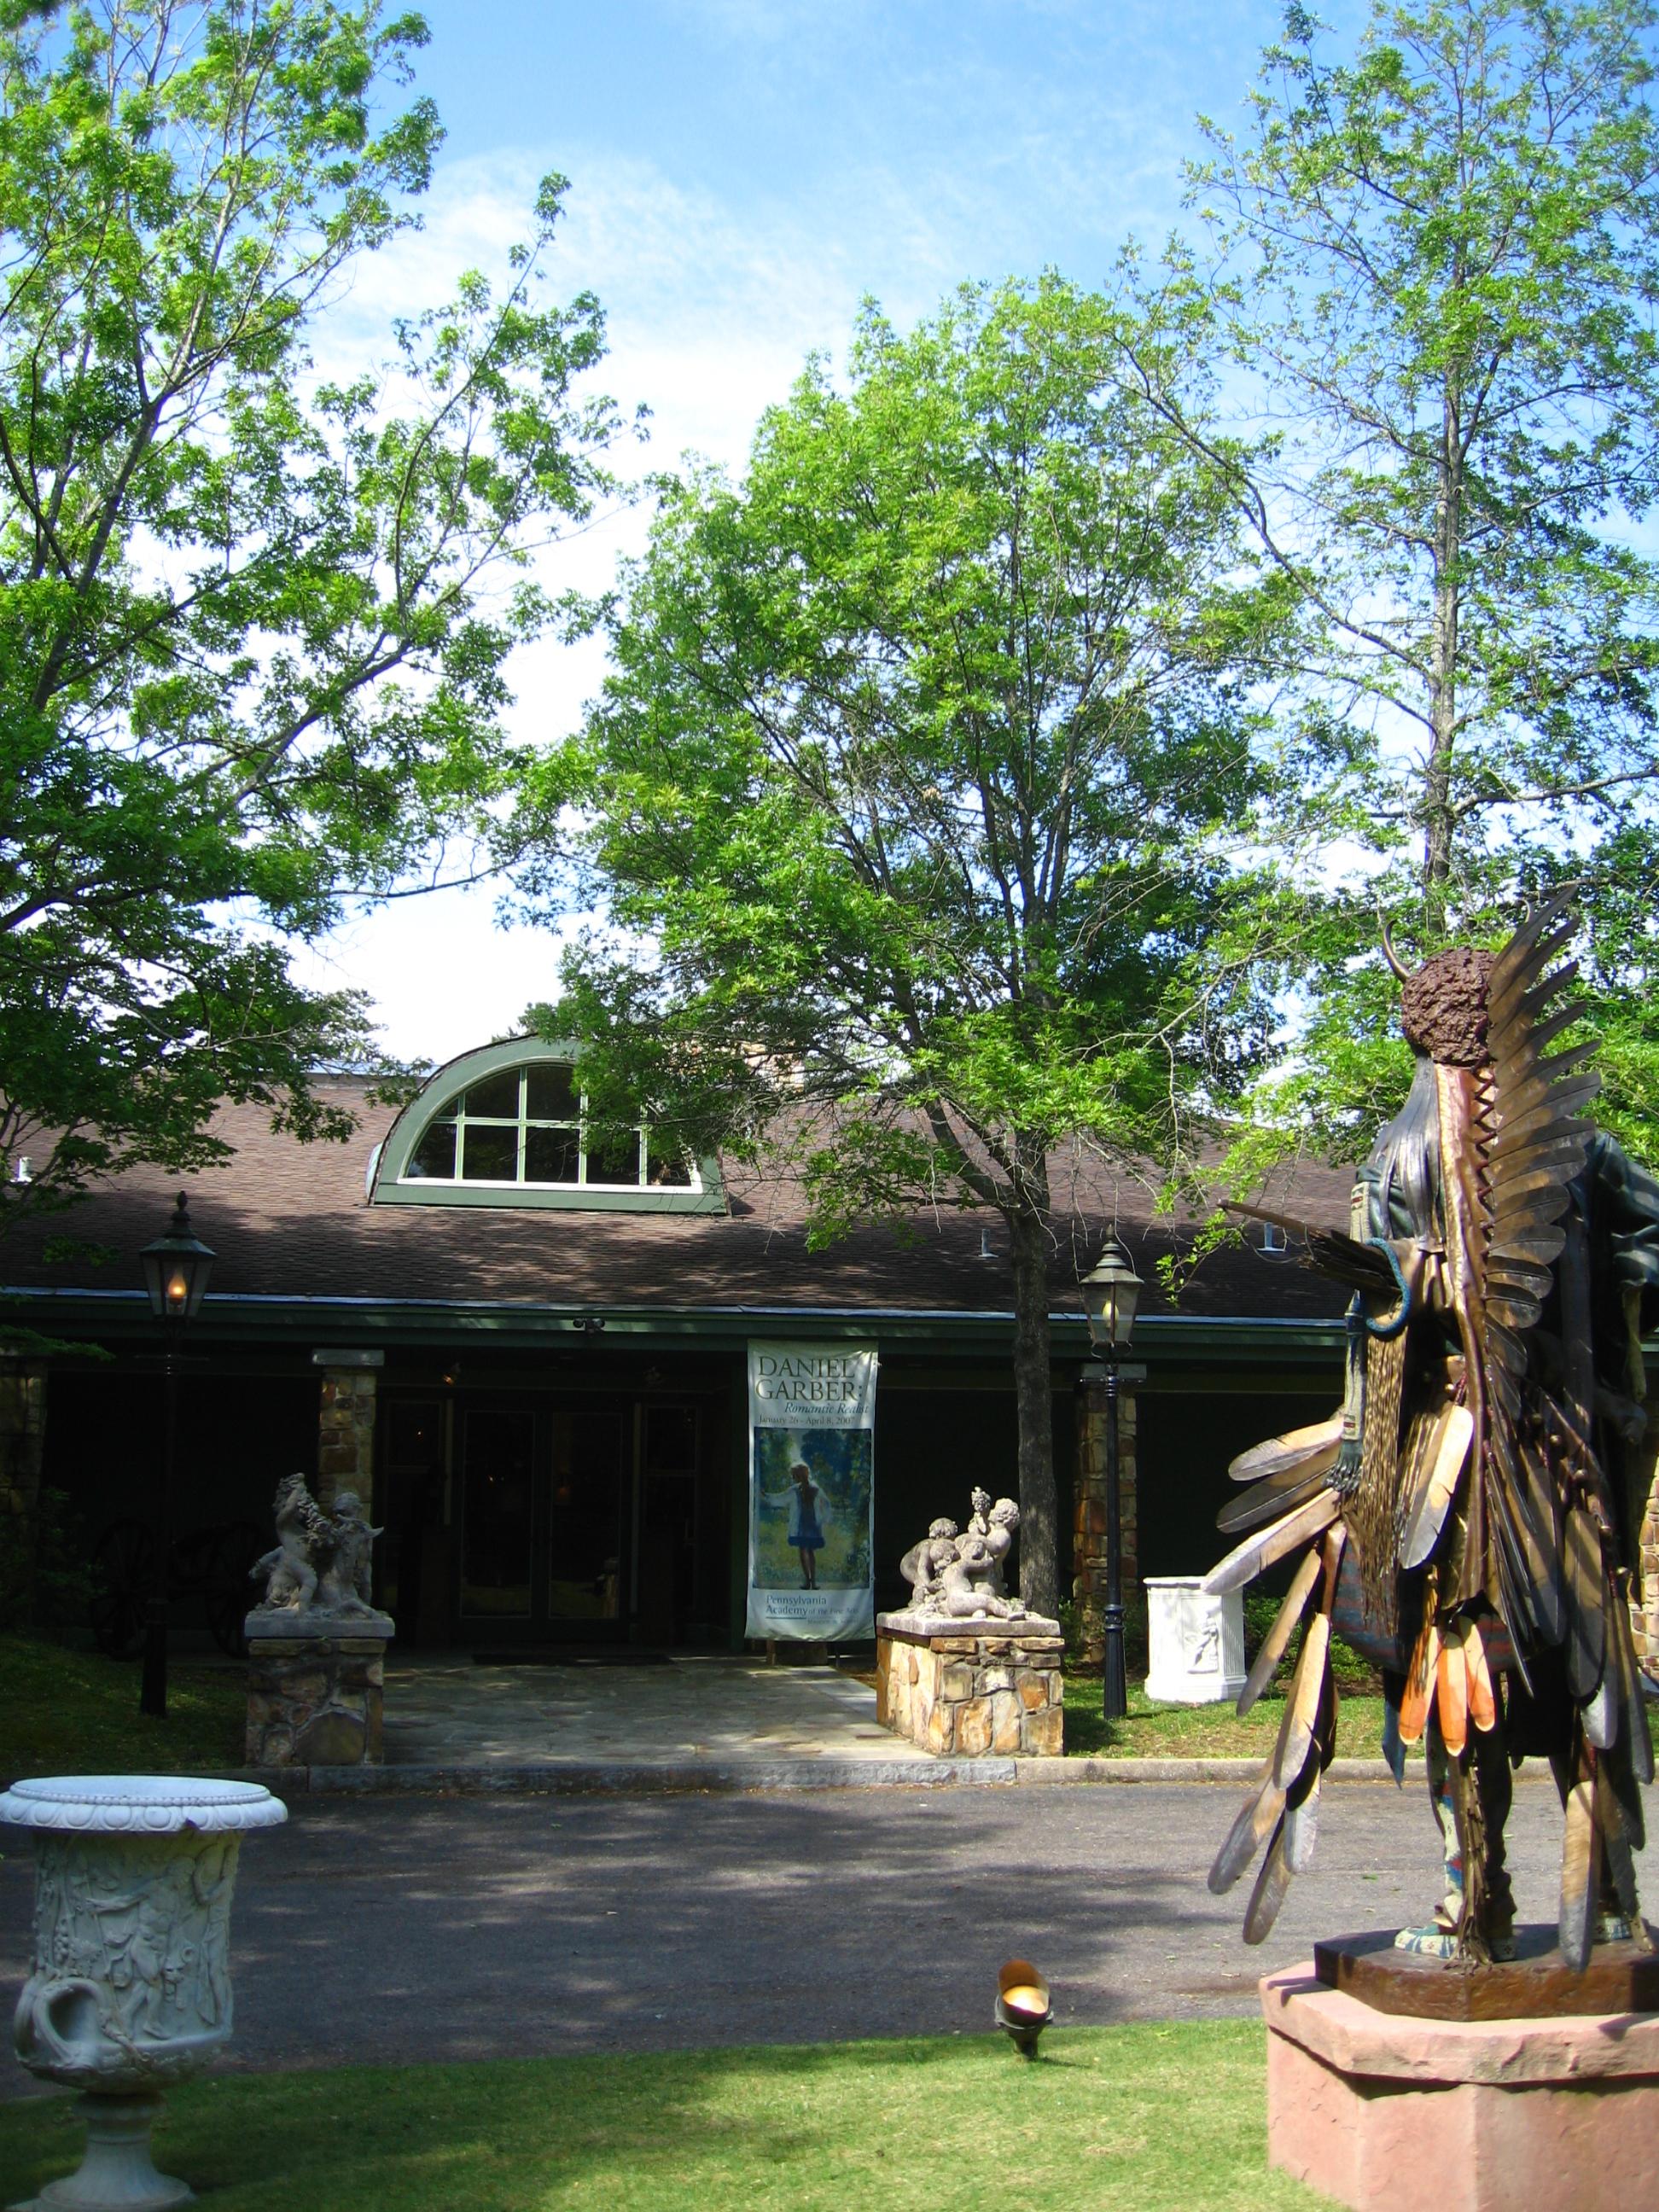 Westervelt Warner Museum, Tuscaloosa, Alabama